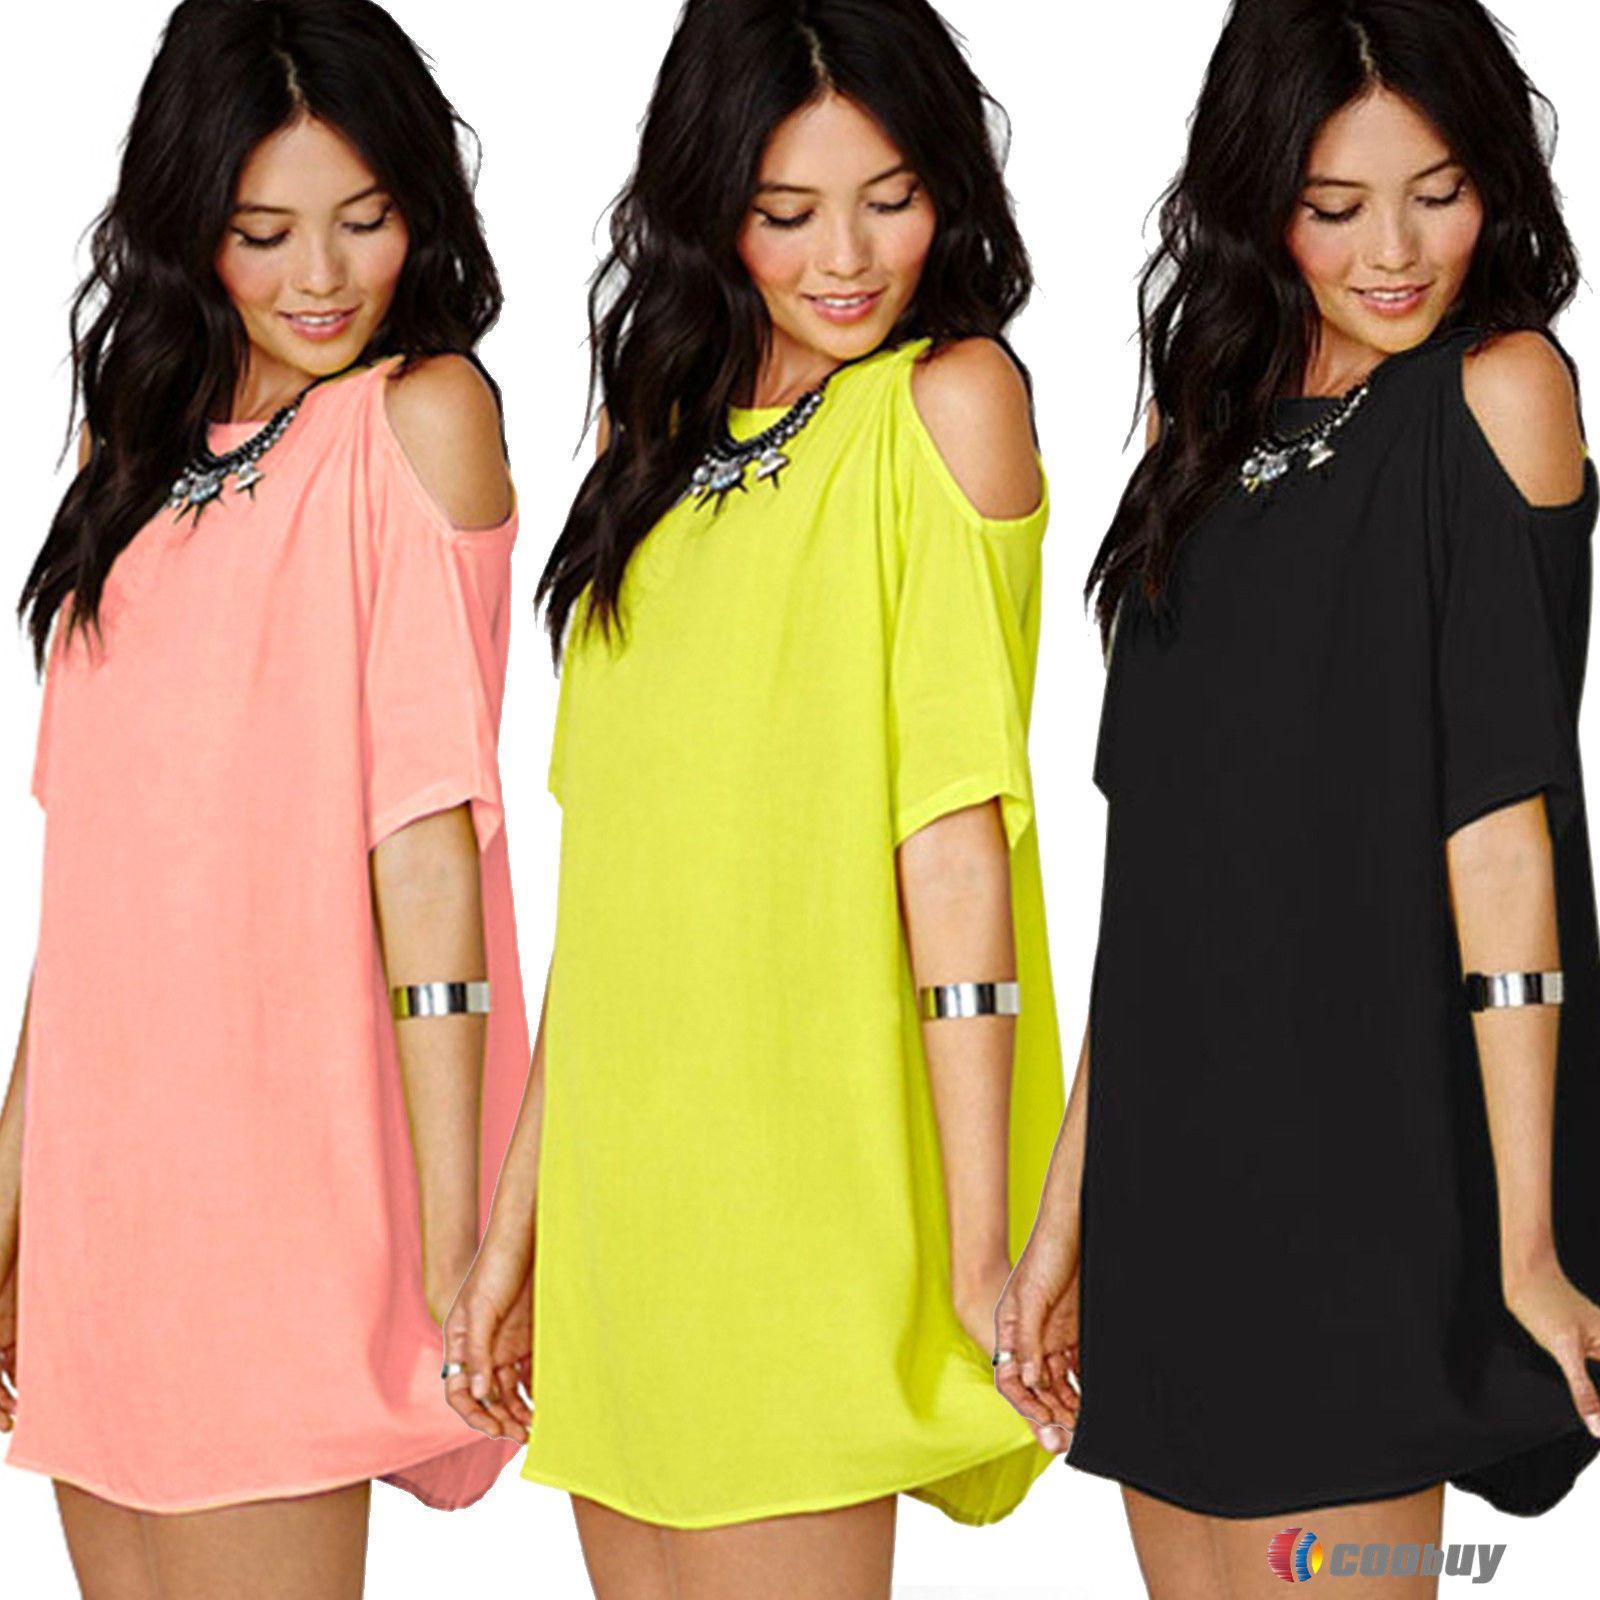 b9f54c9c3195 Uk6-22 Womens Plus Size Chiffon Baggy T-Shirts Blouses Dresses Off Shoulder  Tops